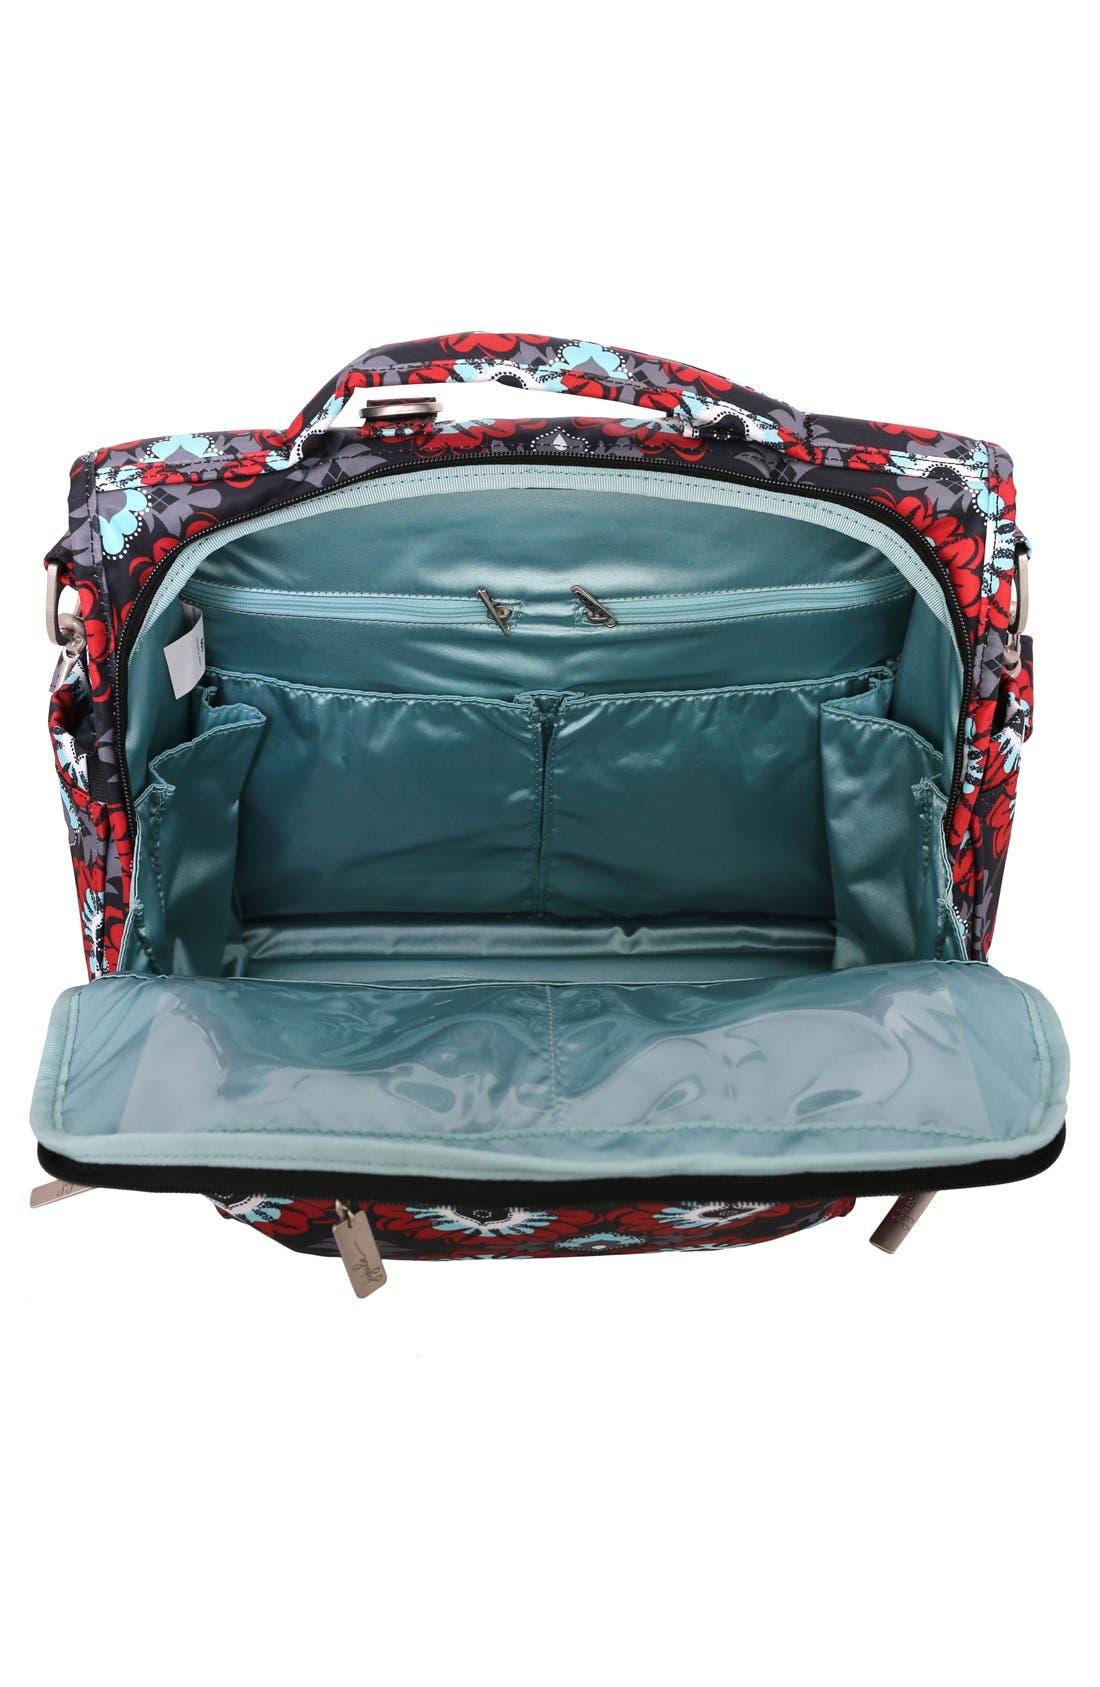 'BFF' Diaper Bag,                             Alternate thumbnail 3, color,                             SWEET SCARLET